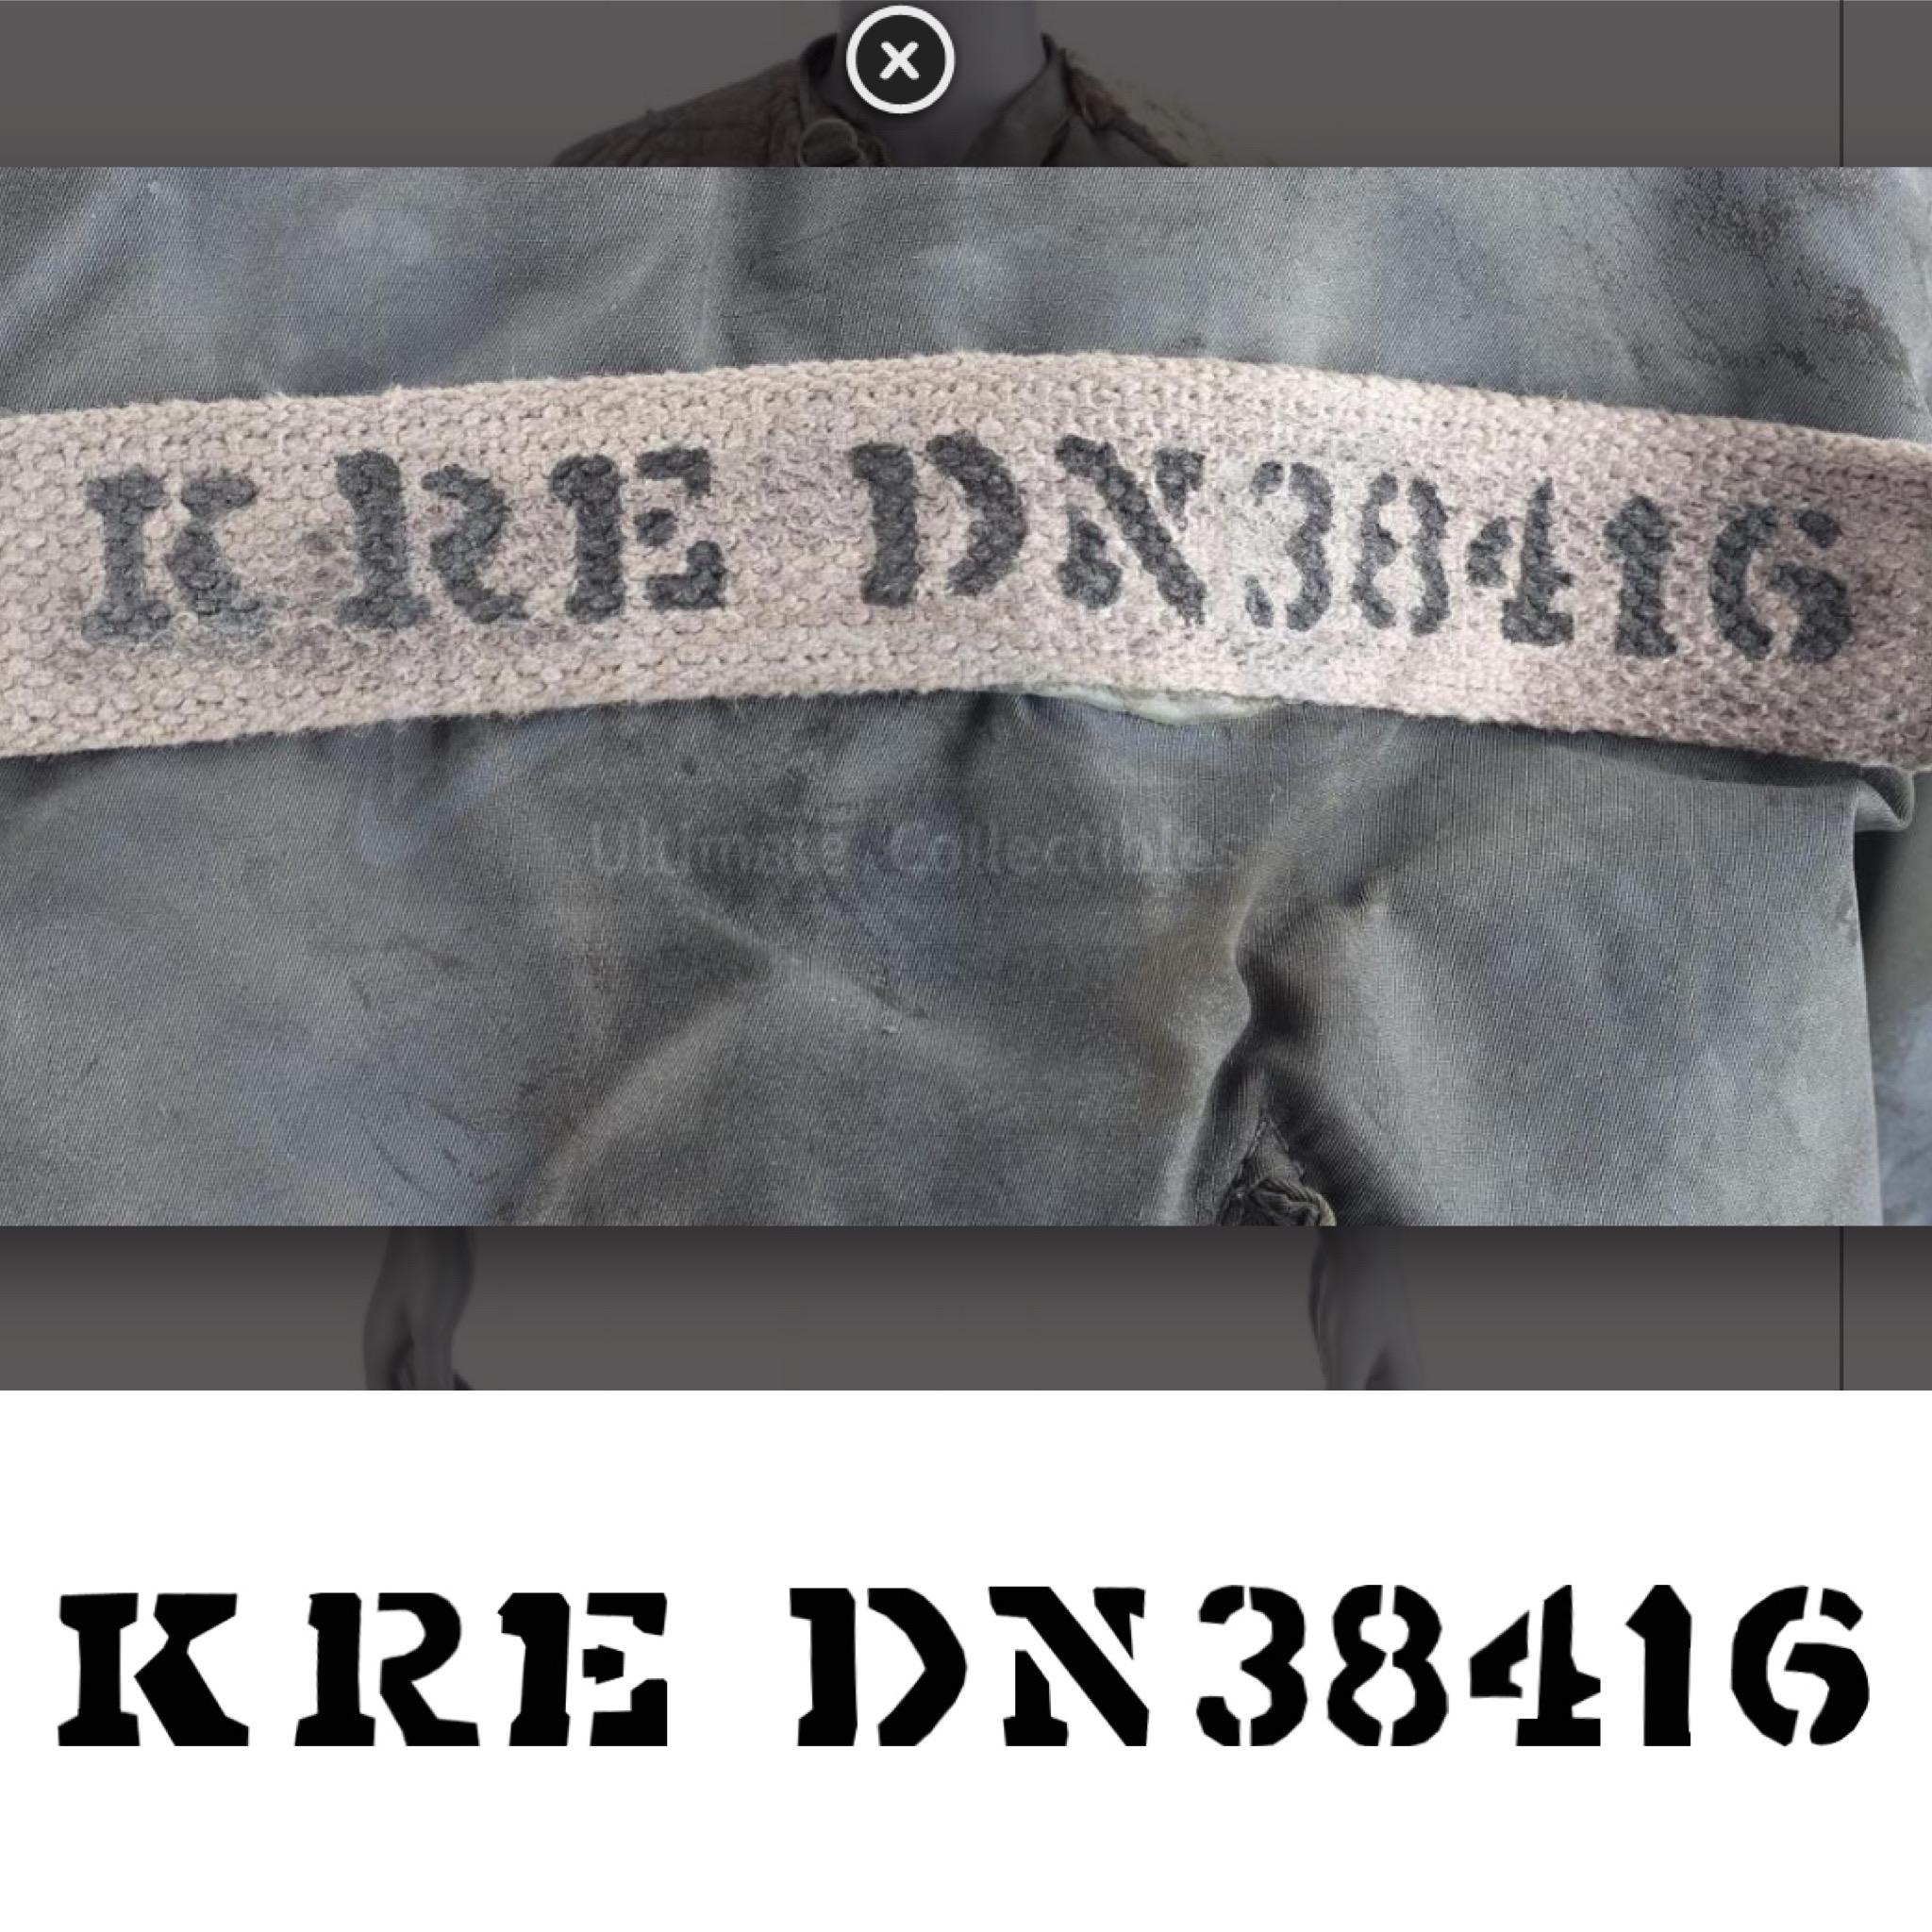 FF9B45E9-DCDA-4CFA-9310-EB74CB9EB706.jpeg